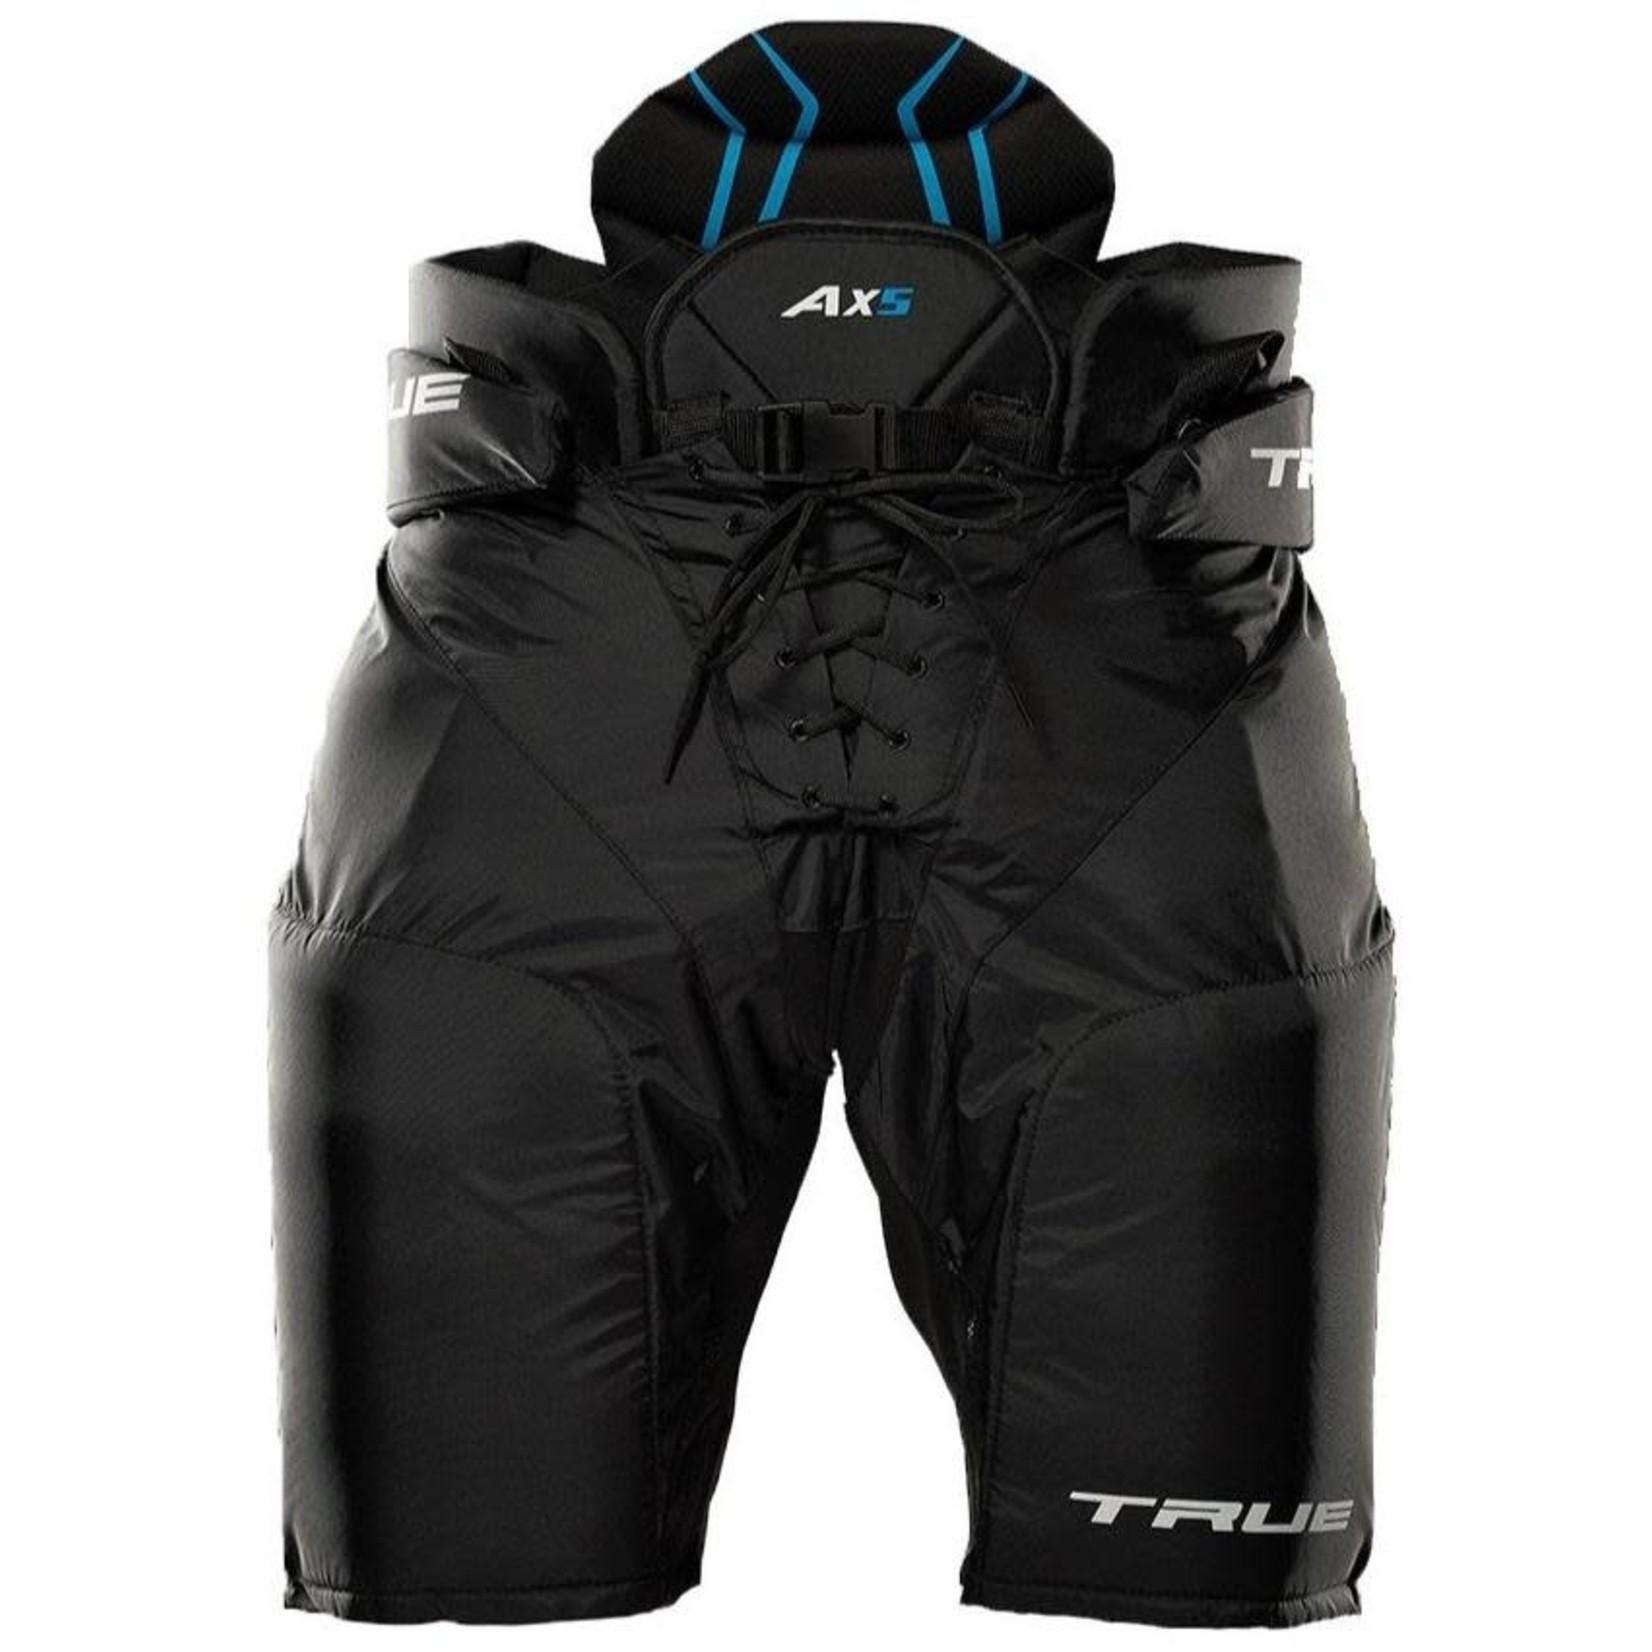 True Hockey True Hockey Pants, AX5, Senior